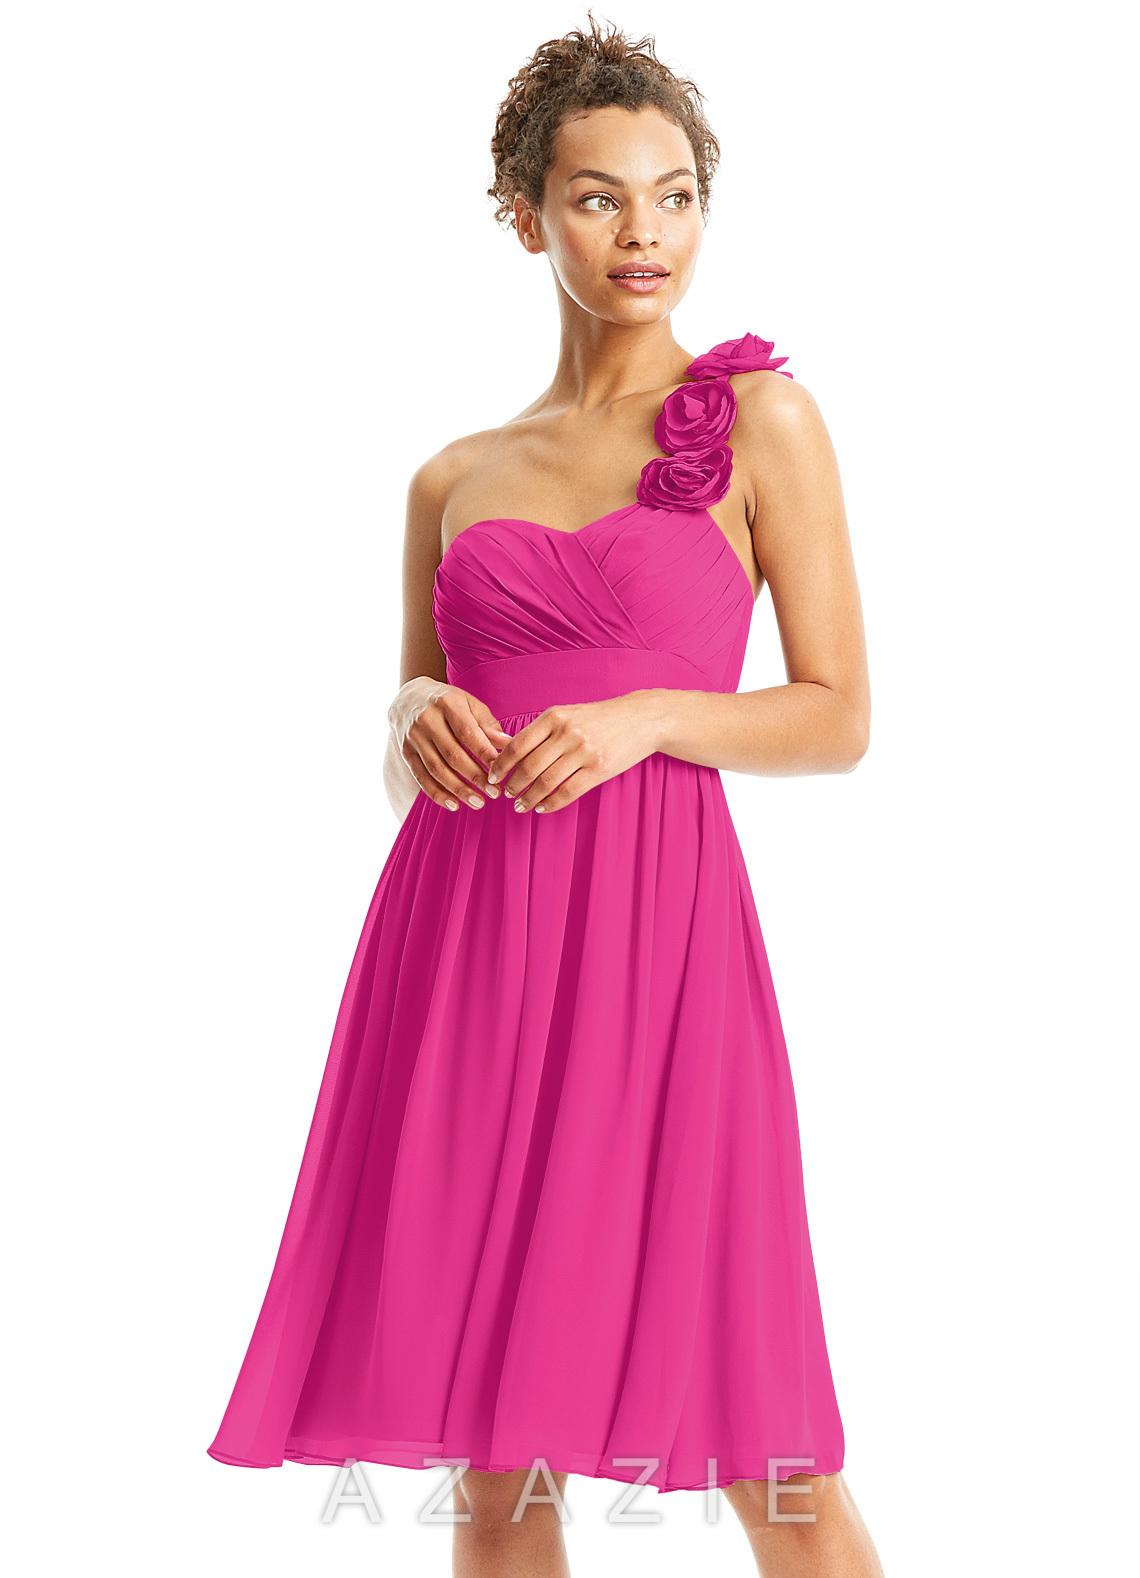 55e5dd938eb Azazie Alyssa Bridesmaid Dresses